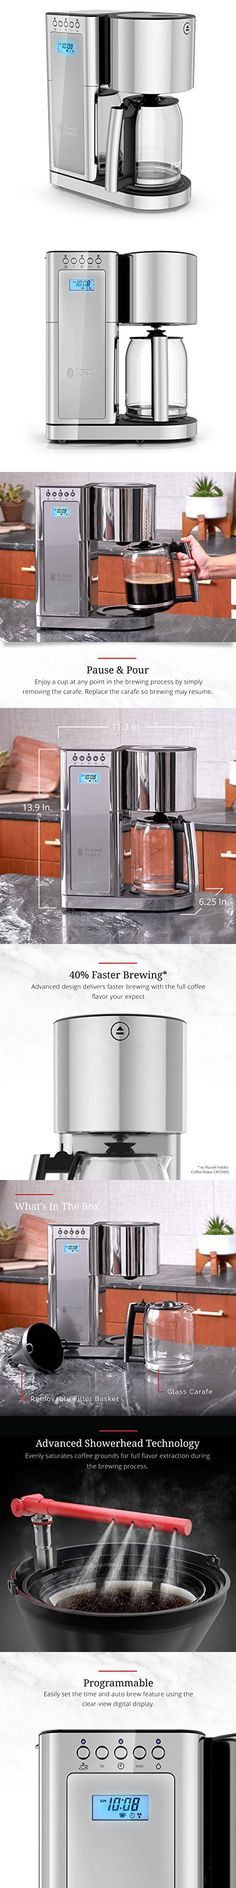 Russell Hobbs Glass Series 8-Cup Coffeemaker, Silver & Stainless Steel, CM8100GYR Coffee Machines, Coffeemaker, Hobbs, Stainless Steel, Glass, Silver, Coffee Pod Machines, Drinkware, Money